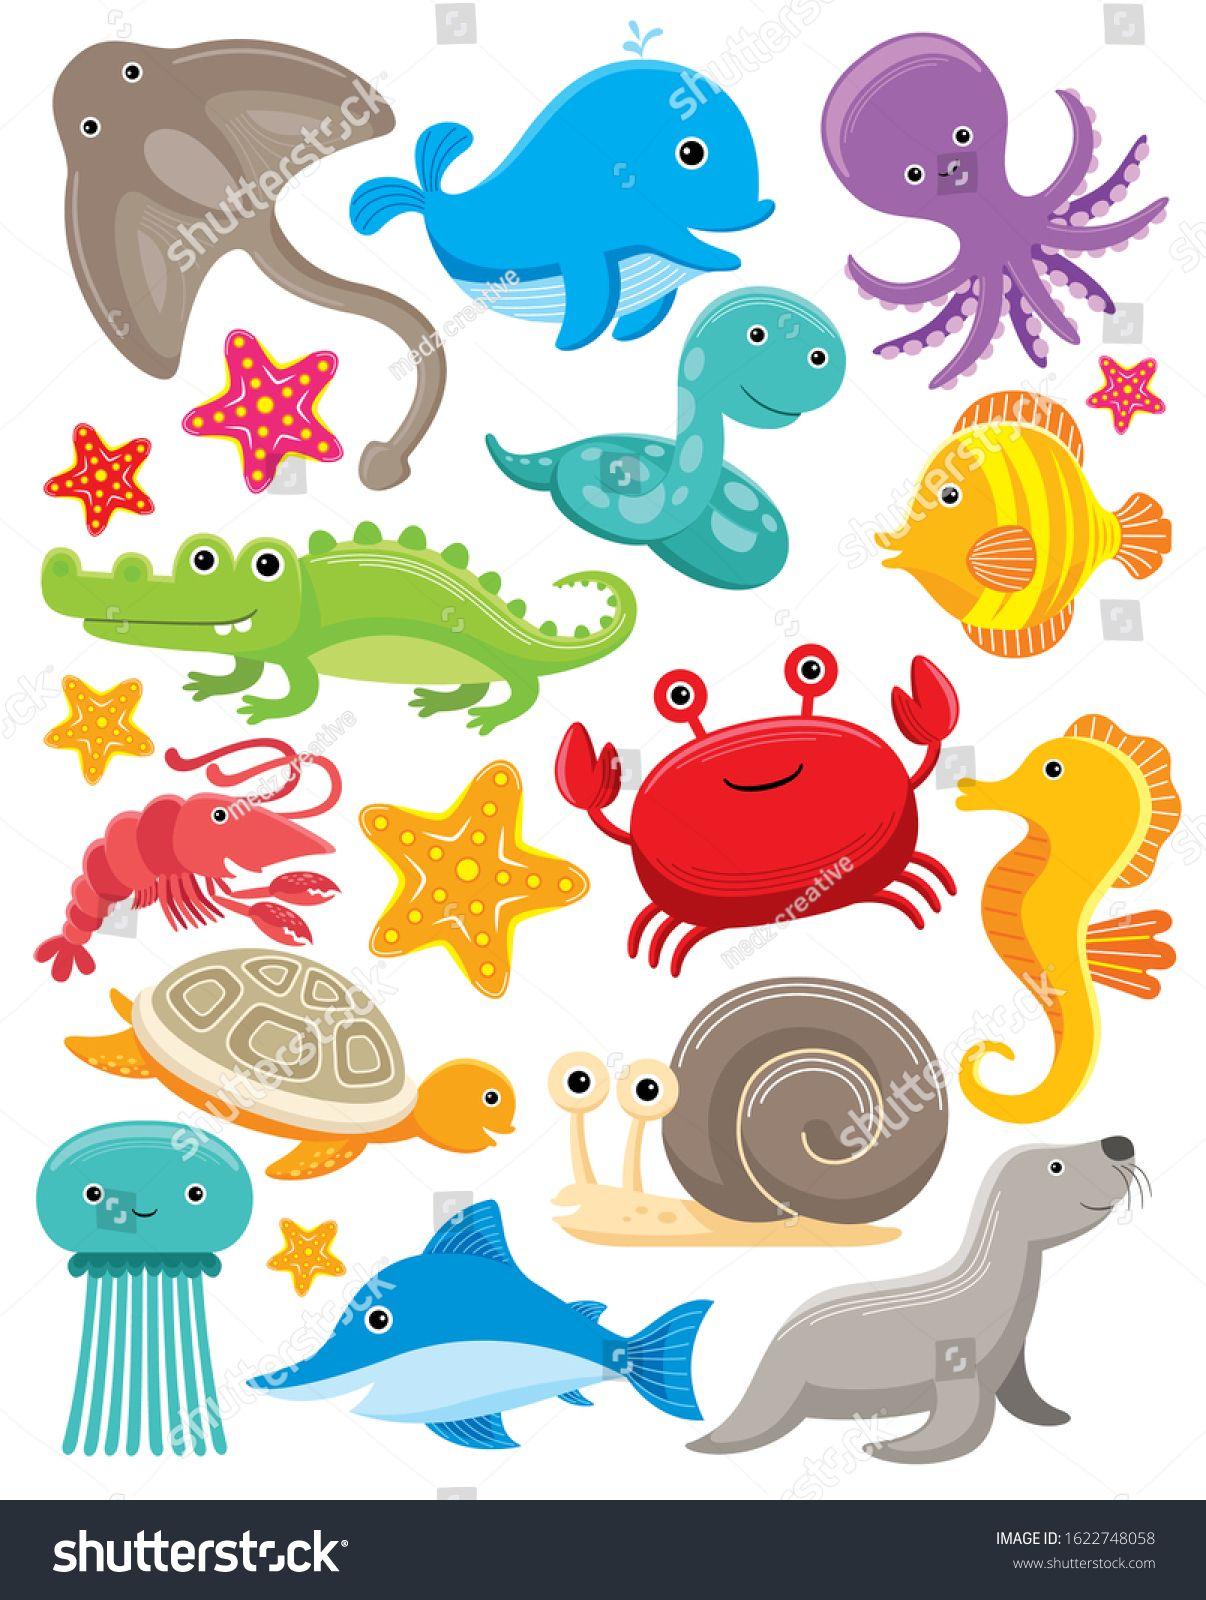 Cute Sea Animals Vector Set Under The Sea Animals Clipart Sea Creatures Clipart Vector Illustration Ad Under The Sea Animals Sea Illustration Sea Animals